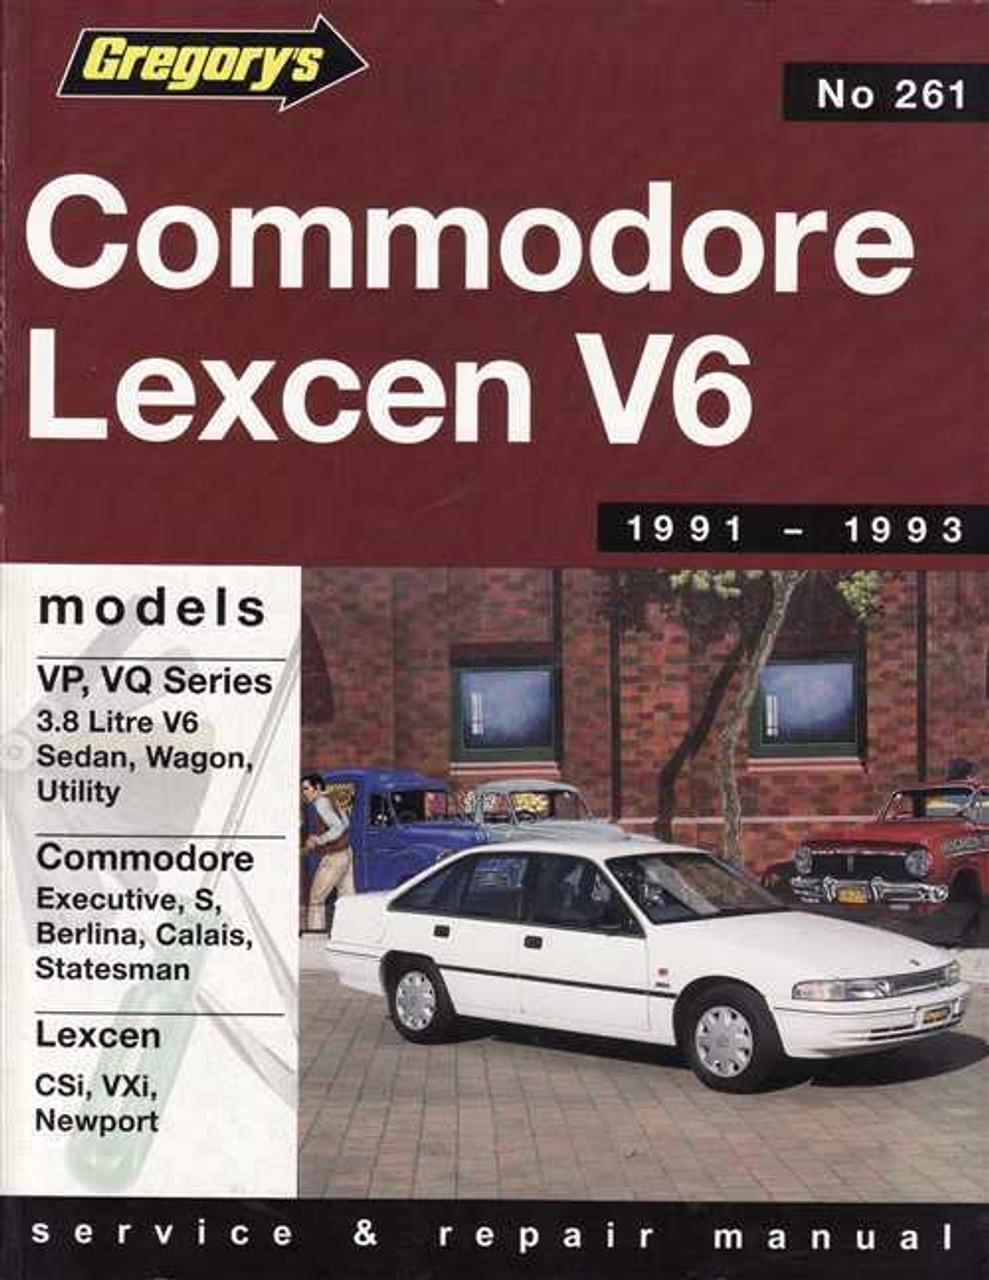 holden commodore \u0026amp; toyota lexcen v6 1991 1993 workshop manual